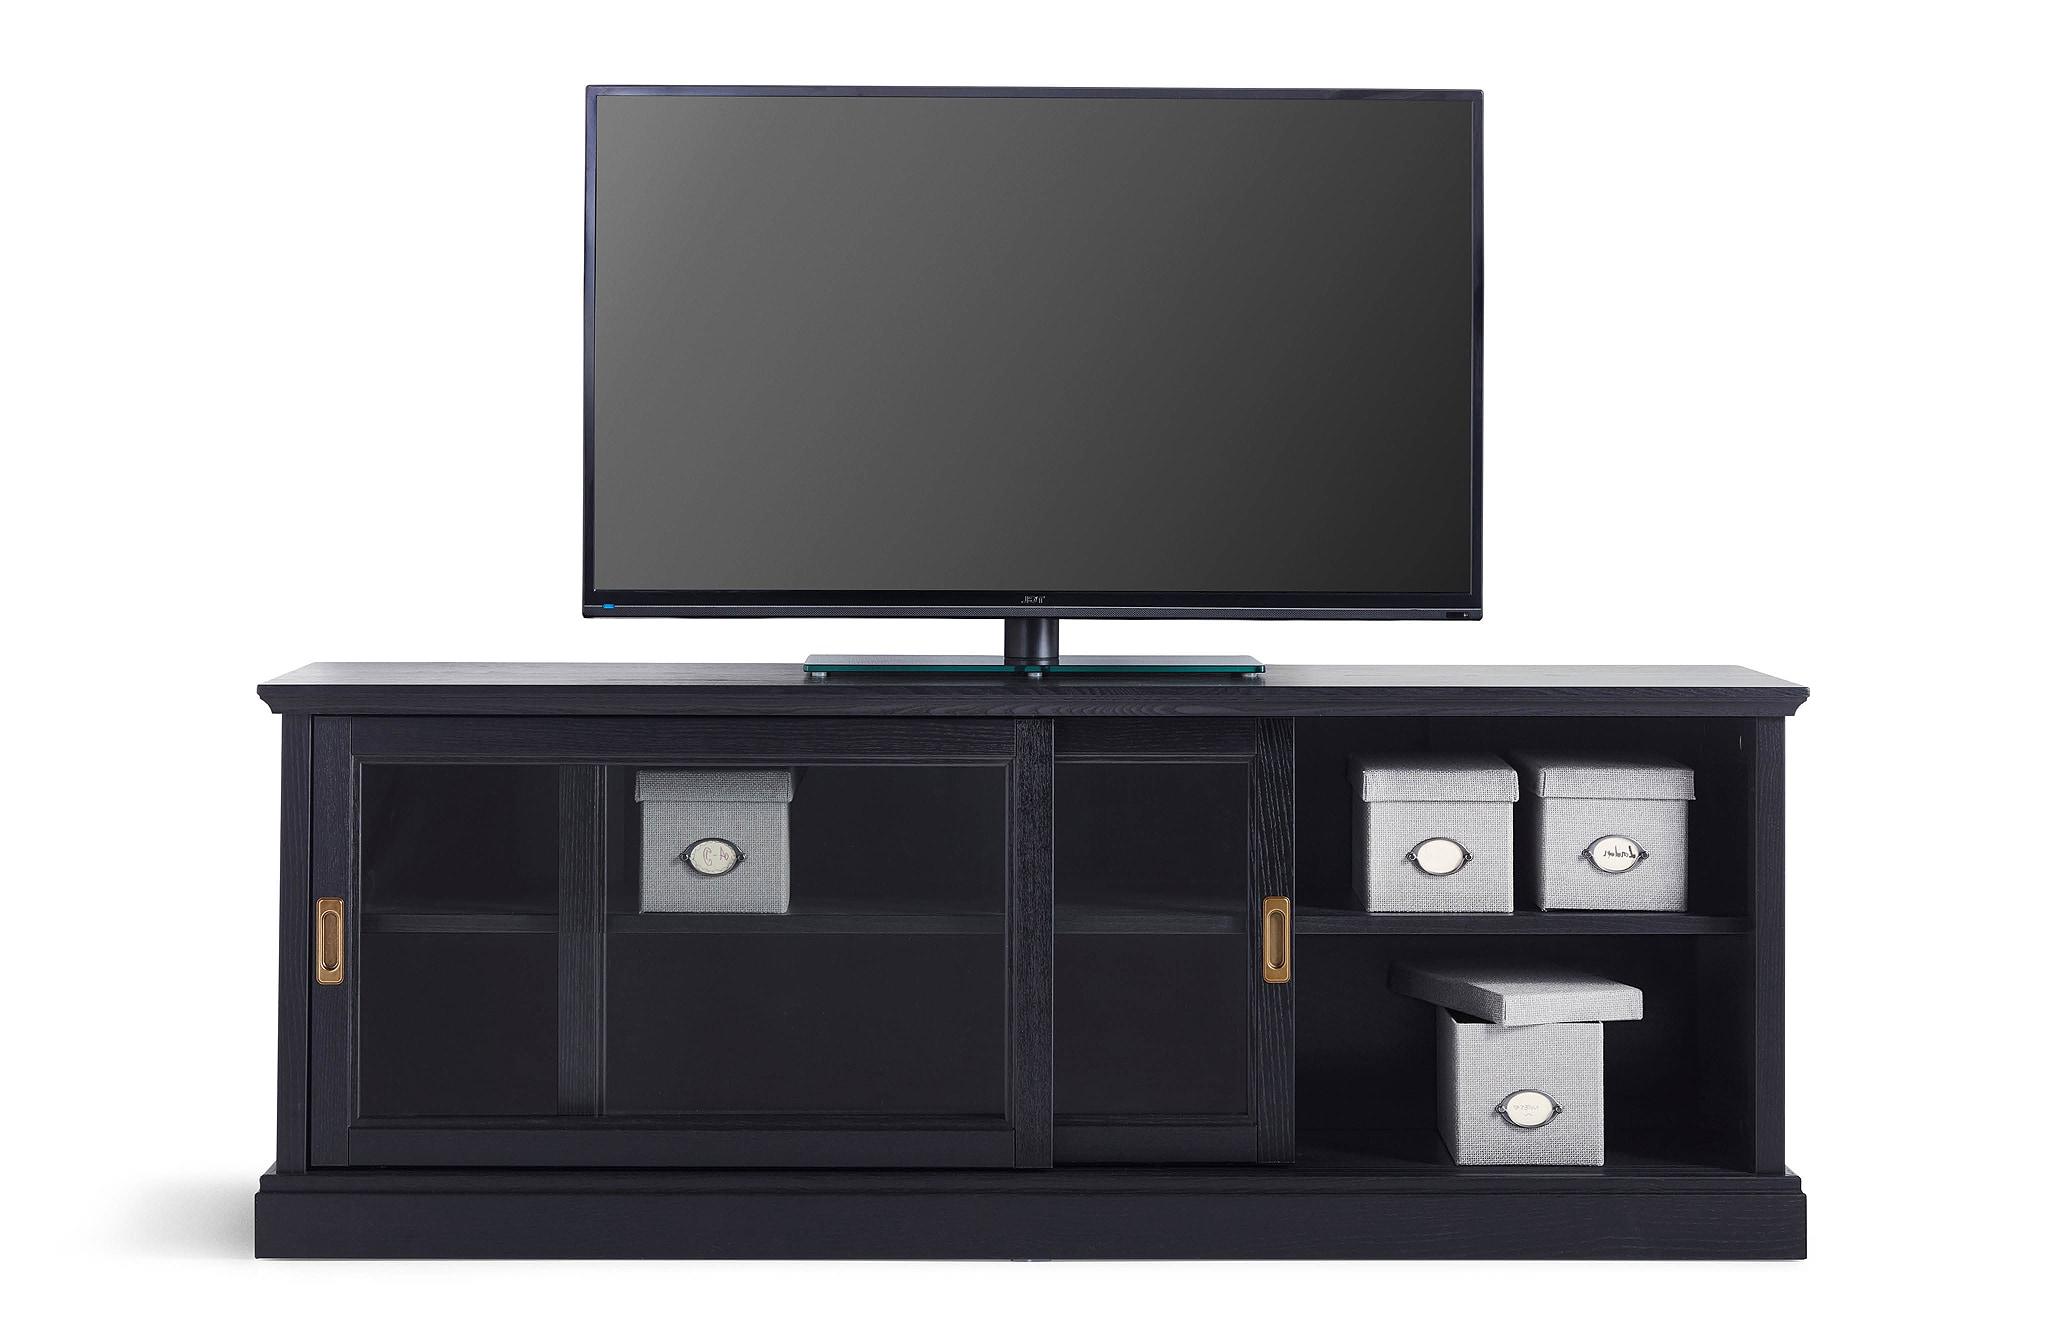 Mesas De Tv Whdr Muebles De Tv Y Muebles Para El Salà N Pra Online Ikea